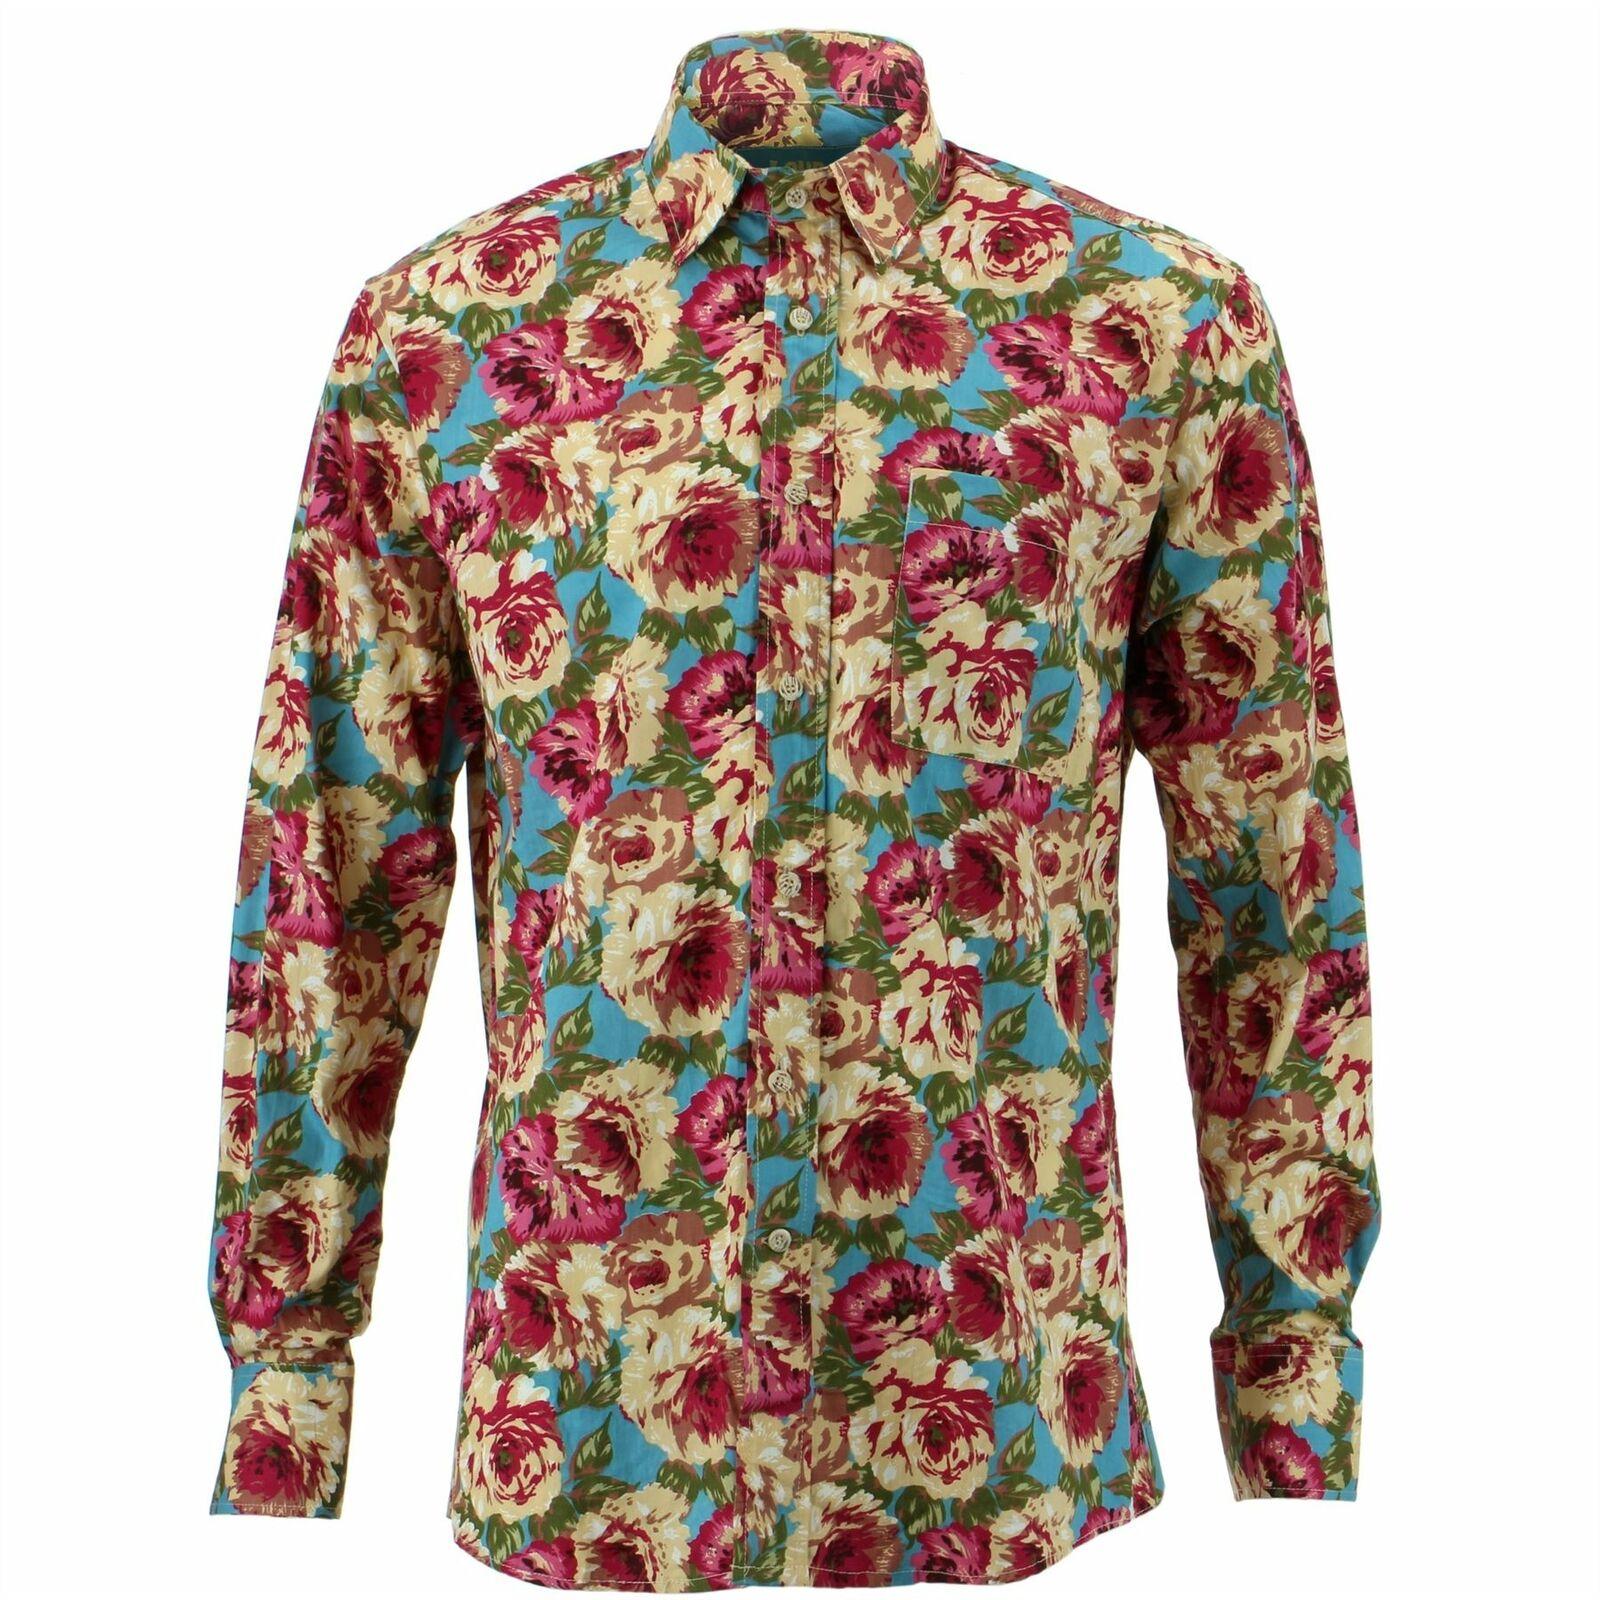 Mens Shirt Loud Originals REGULAR FIT  Floral Retro Psychedelic Fancy